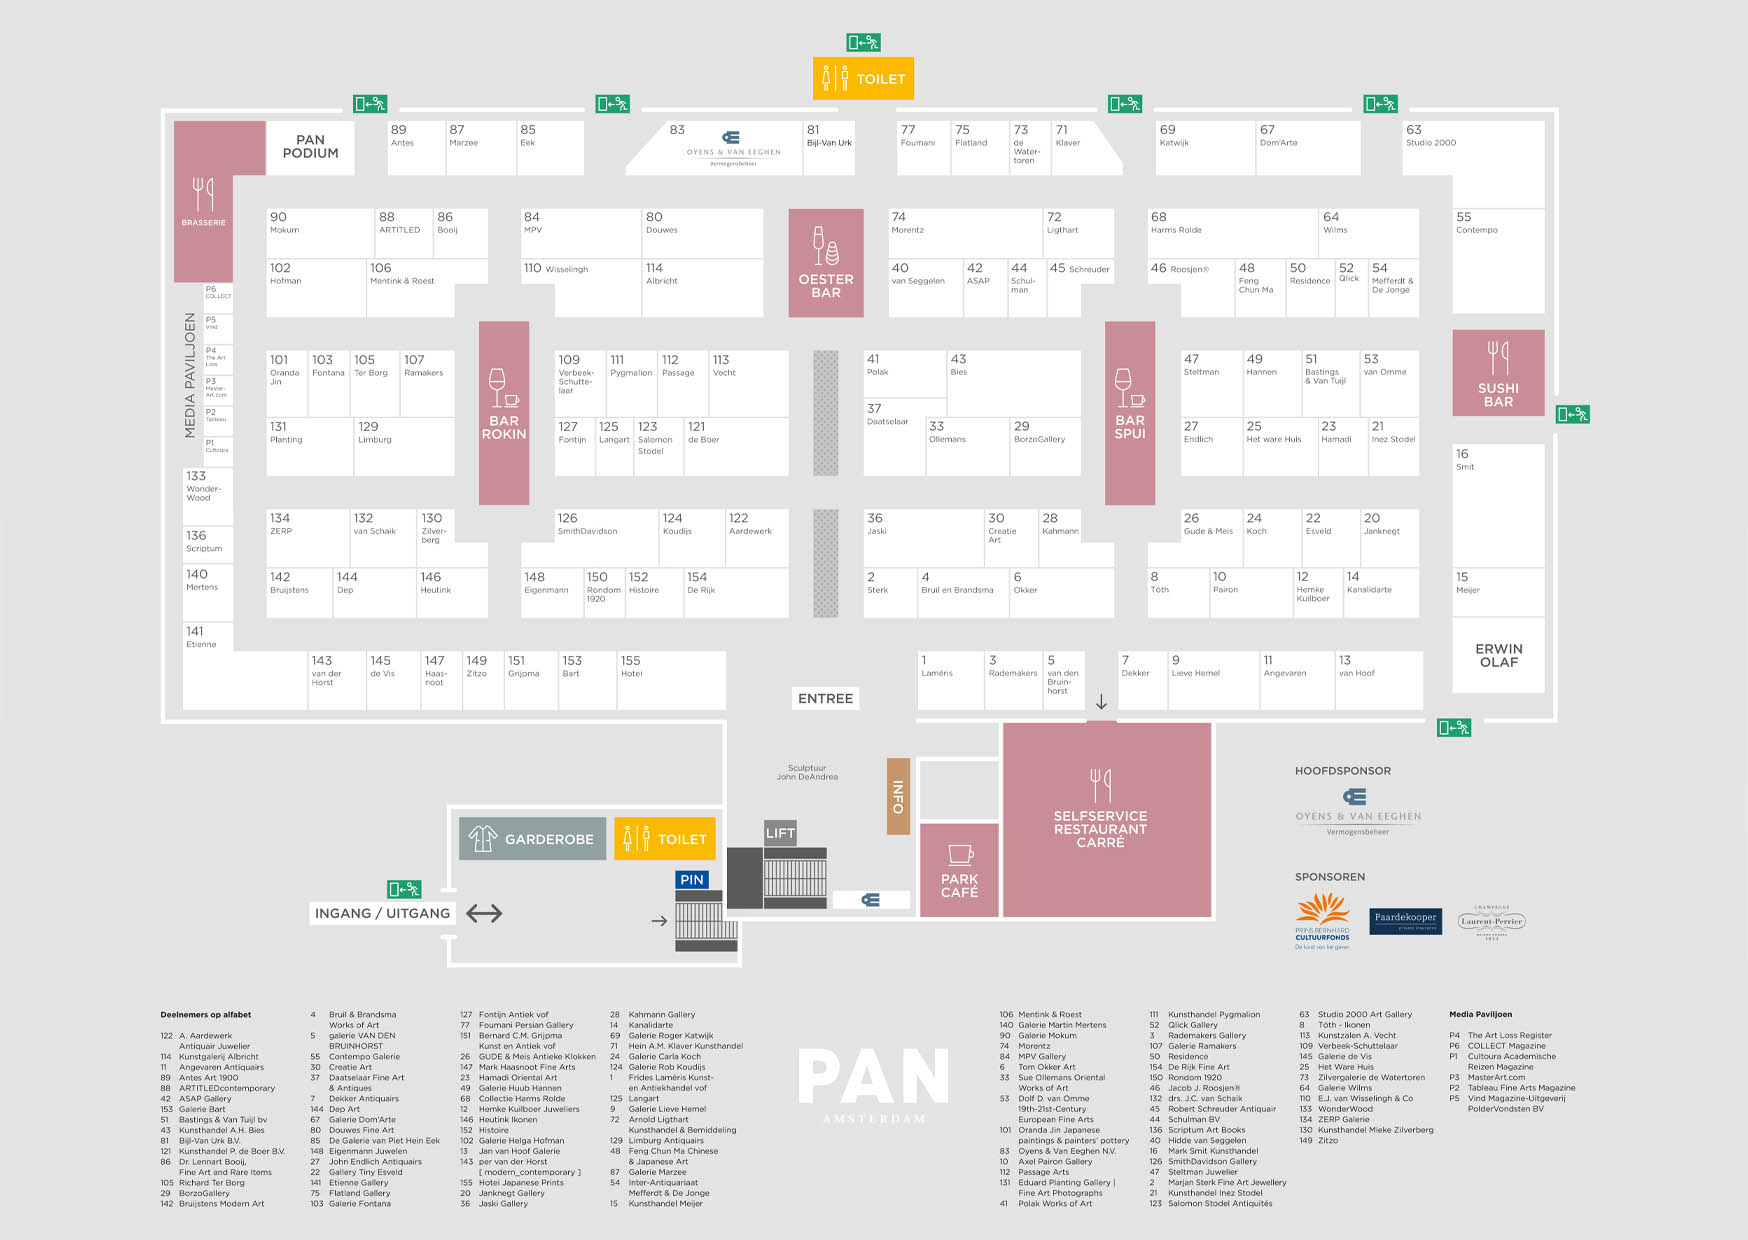 PAN Amsterdam, Amsterdam, 2018, beurs, kunst, art, fair, antiek, design, grafisch, ontwerp, grafisch ontwerp, graphic design, campagne, erwin olaf, fotografie, folder, pan podium, podium, flyer, editoriaal, erwin olaf, plattegrond, plattegrondbord, folder, bord, signing, beurs